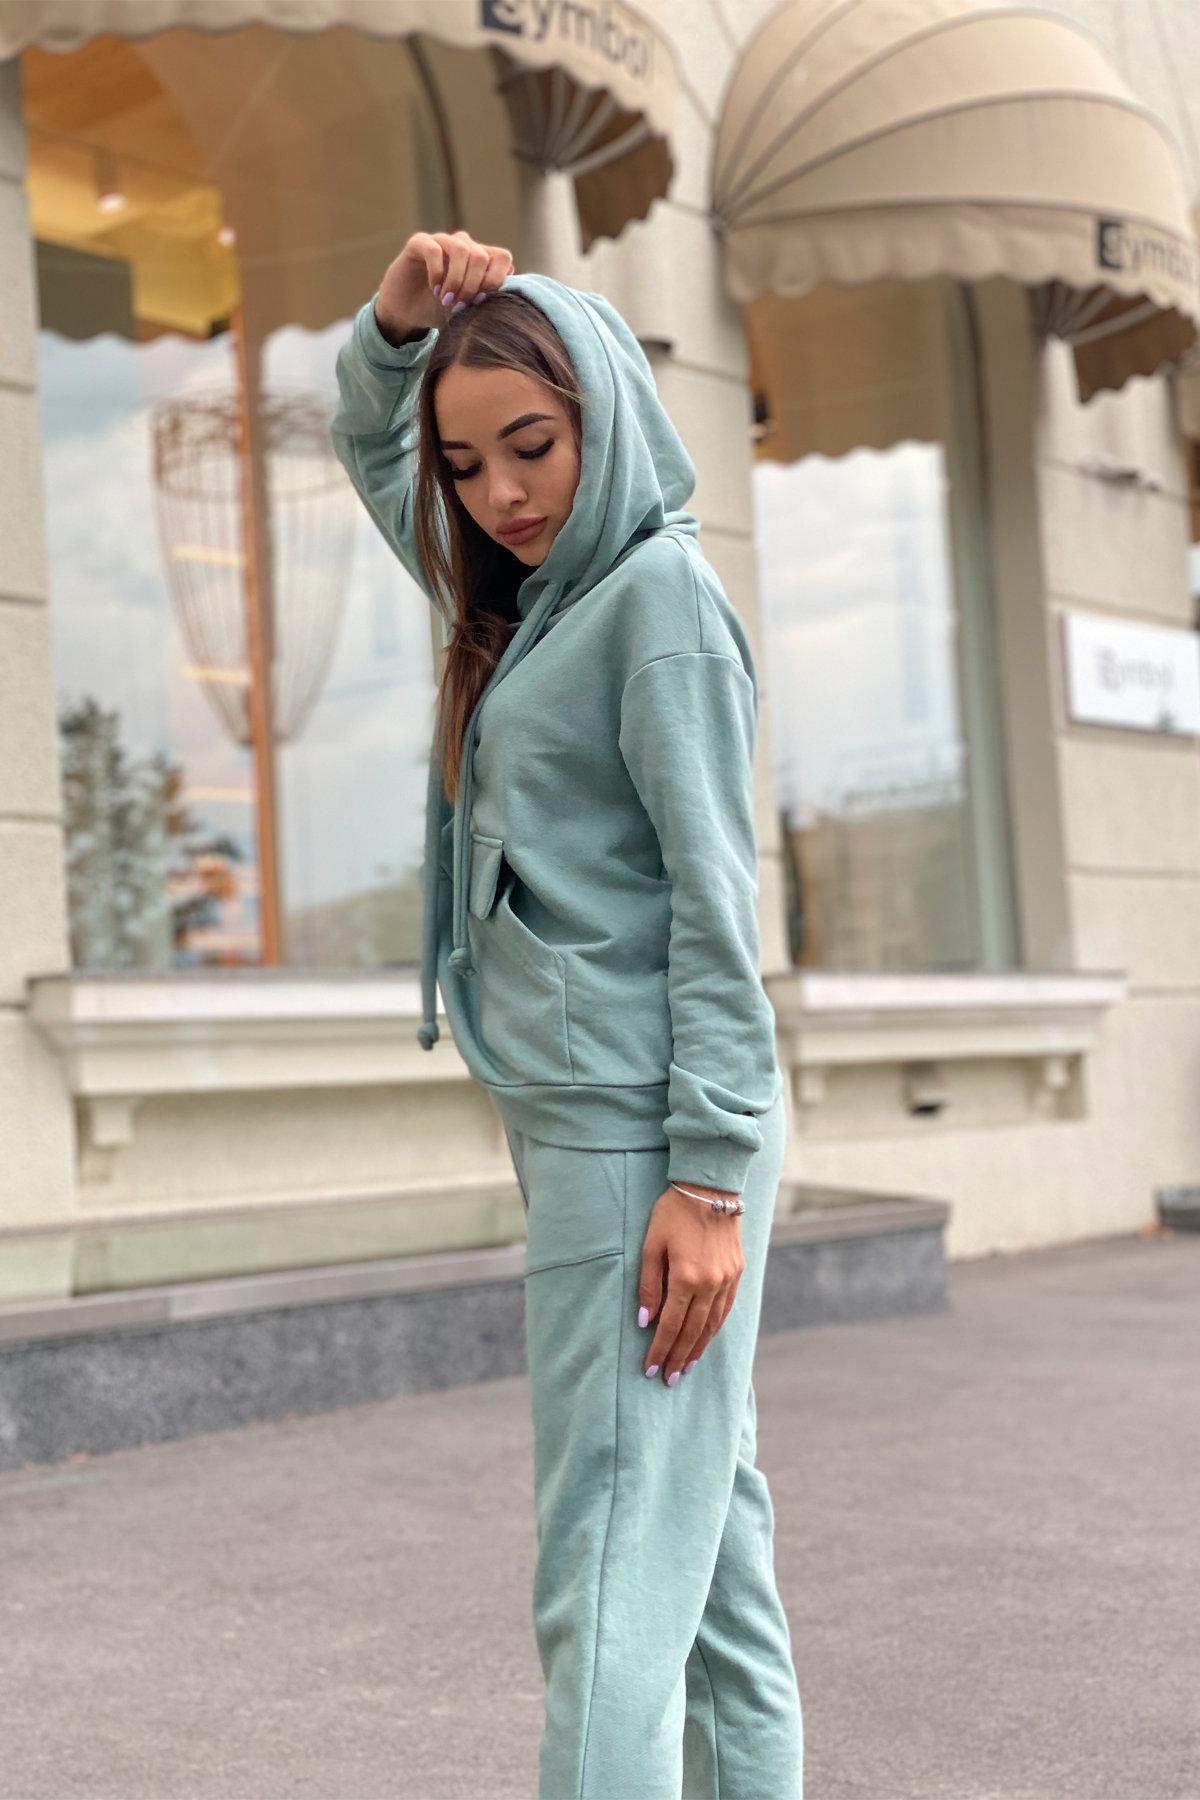 Костюм Бруклин 8996 АРТ. 45899 Цвет: Олива - фото 3, интернет магазин tm-modus.ru